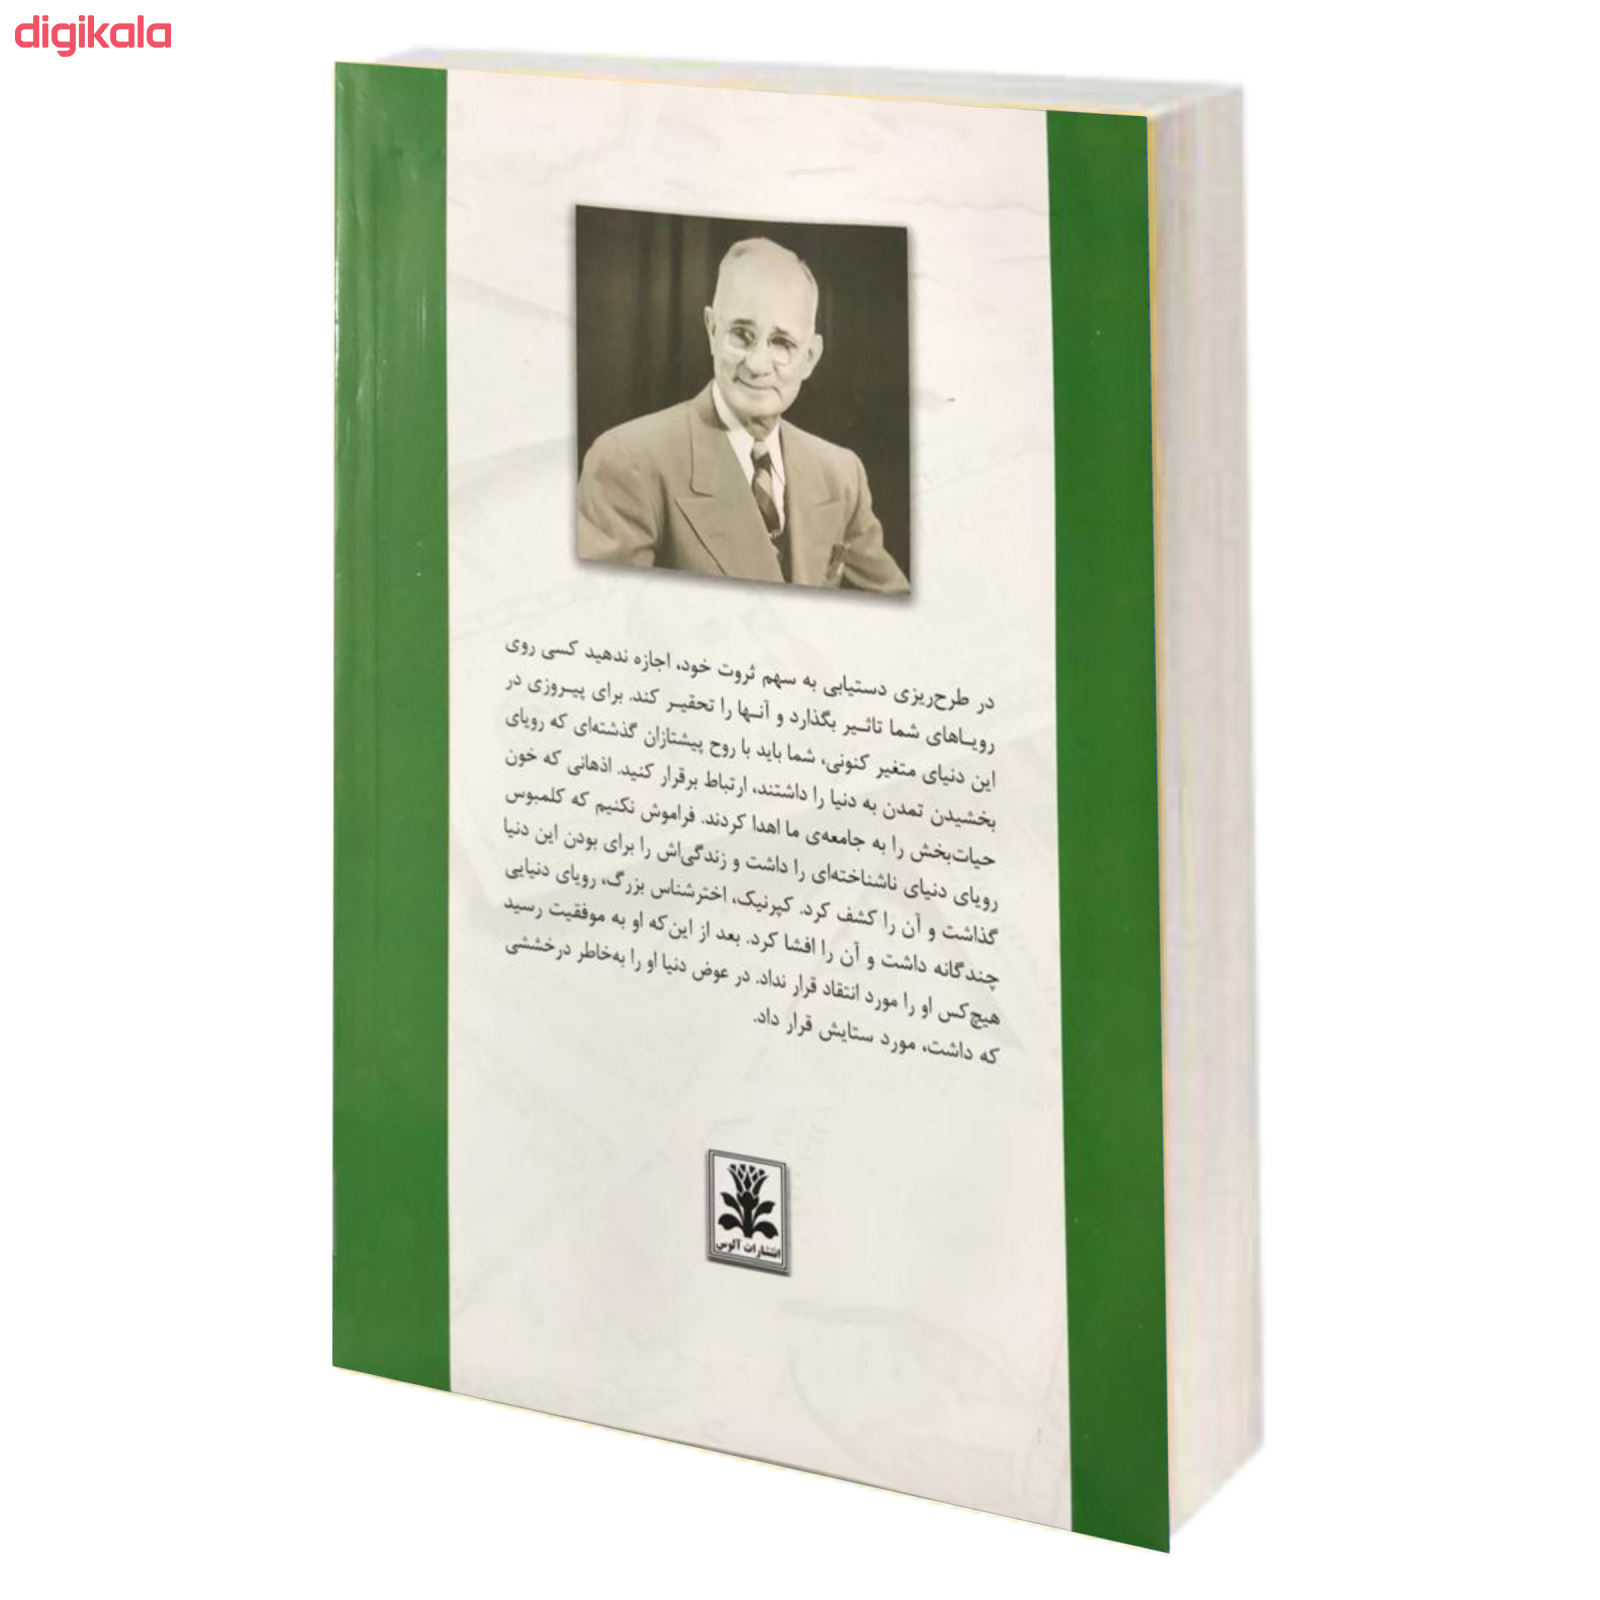 کتاب بیندیشید و ثروتمند شوید اثر  ناپلئون هیل نشر آلوس main 1 1